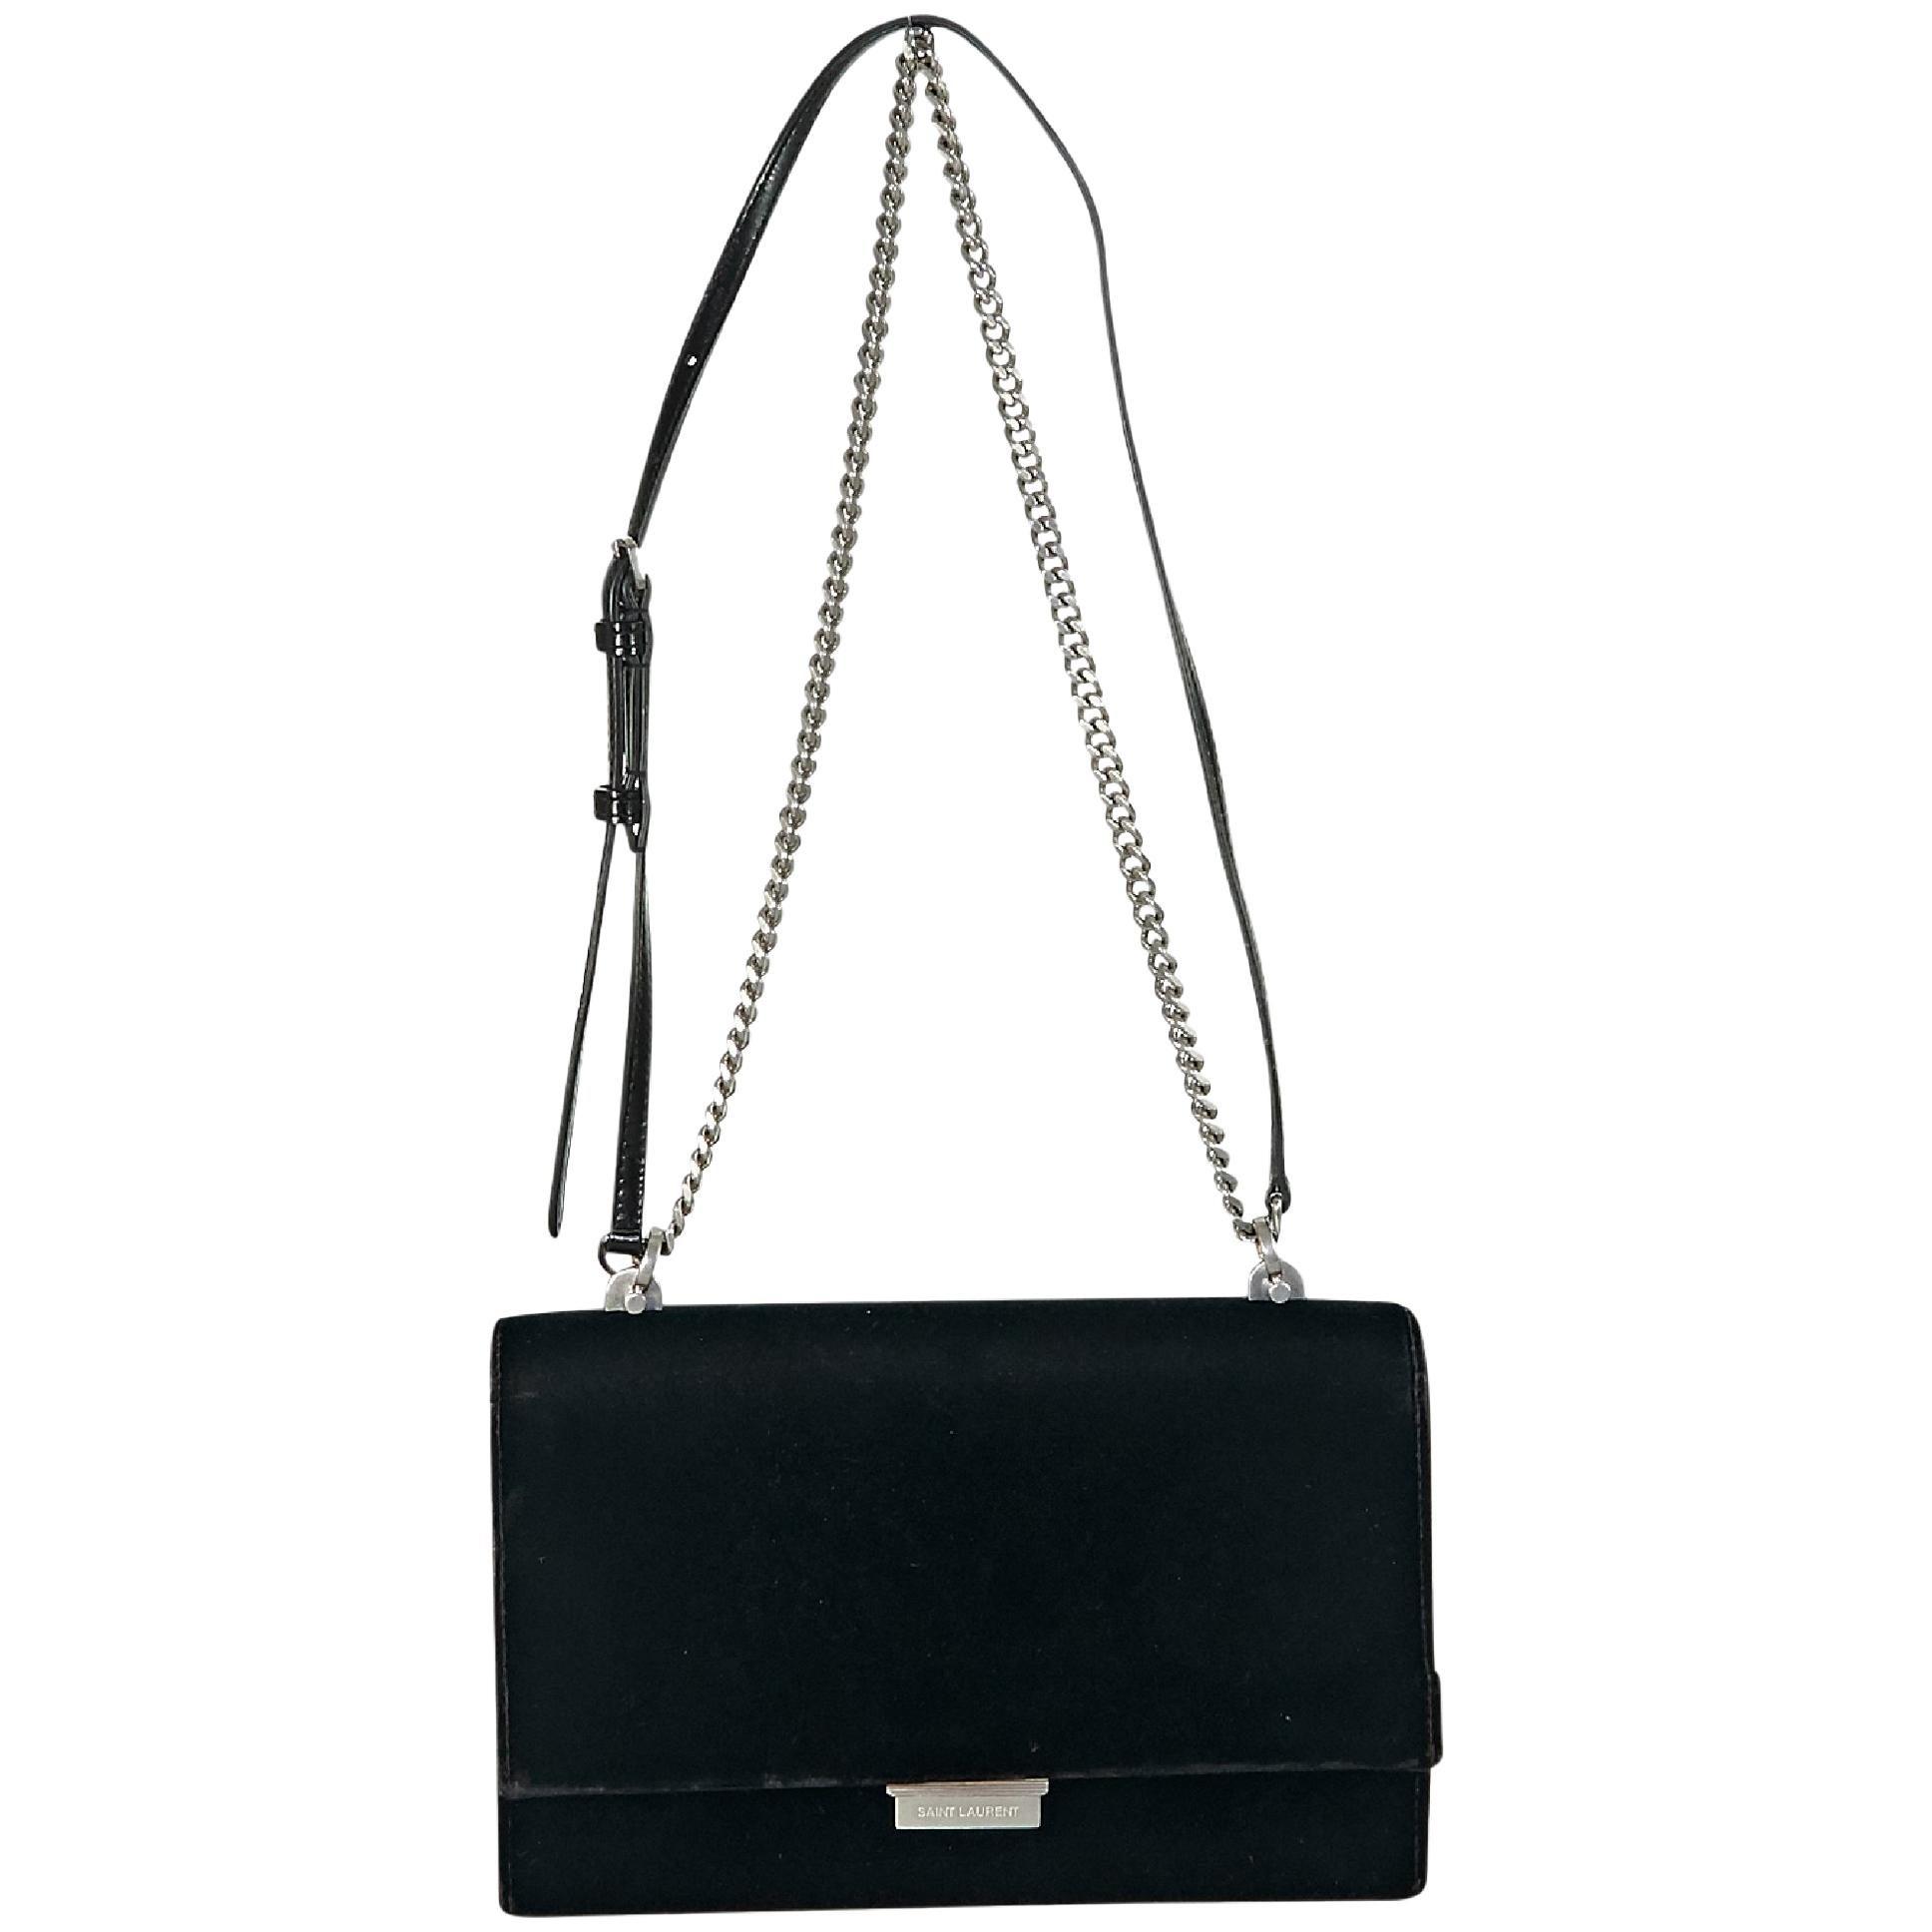 9912faa258 Vintage Yves Saint Laurent Handbags and Purses - 212 For Sale at 1stdibs